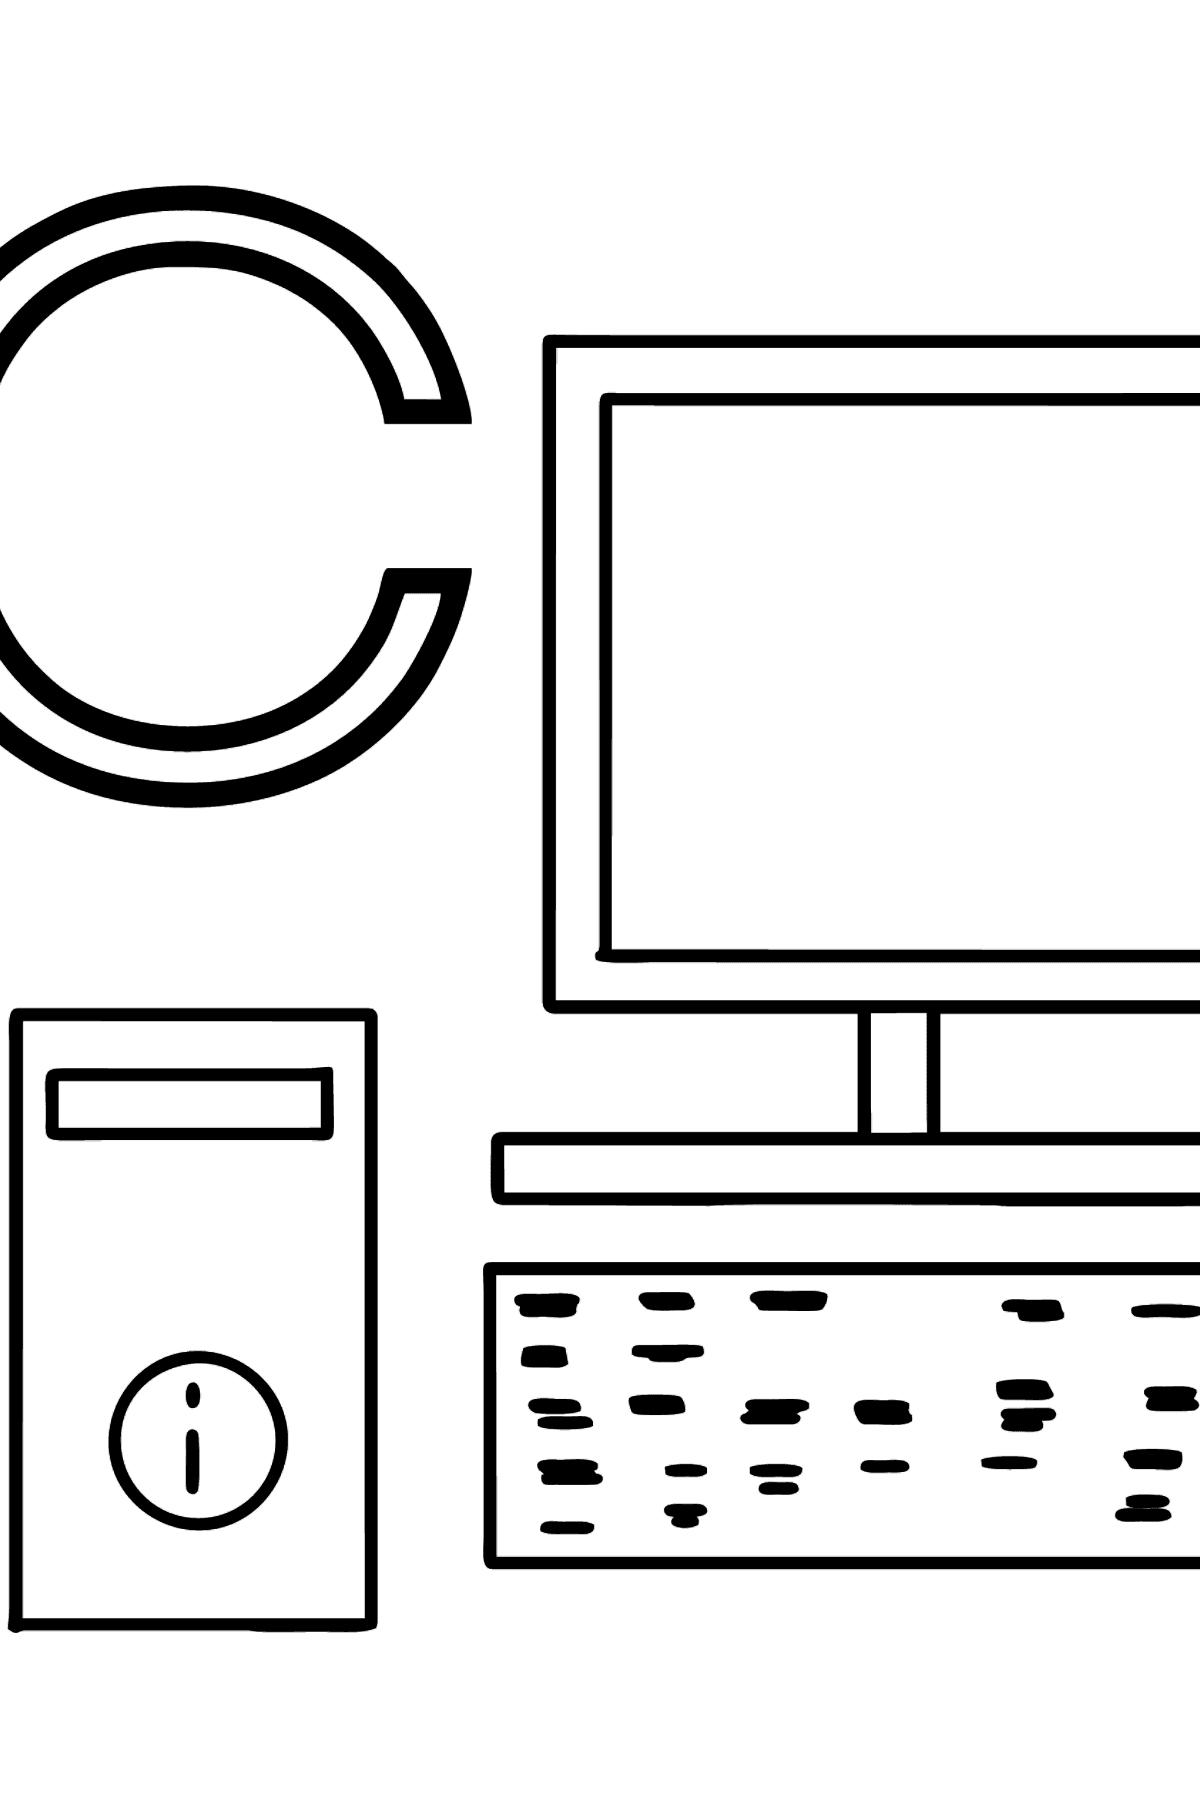 Portuguese Letter C coloring pages - COMPUTADOR - Coloring Pages for Kids